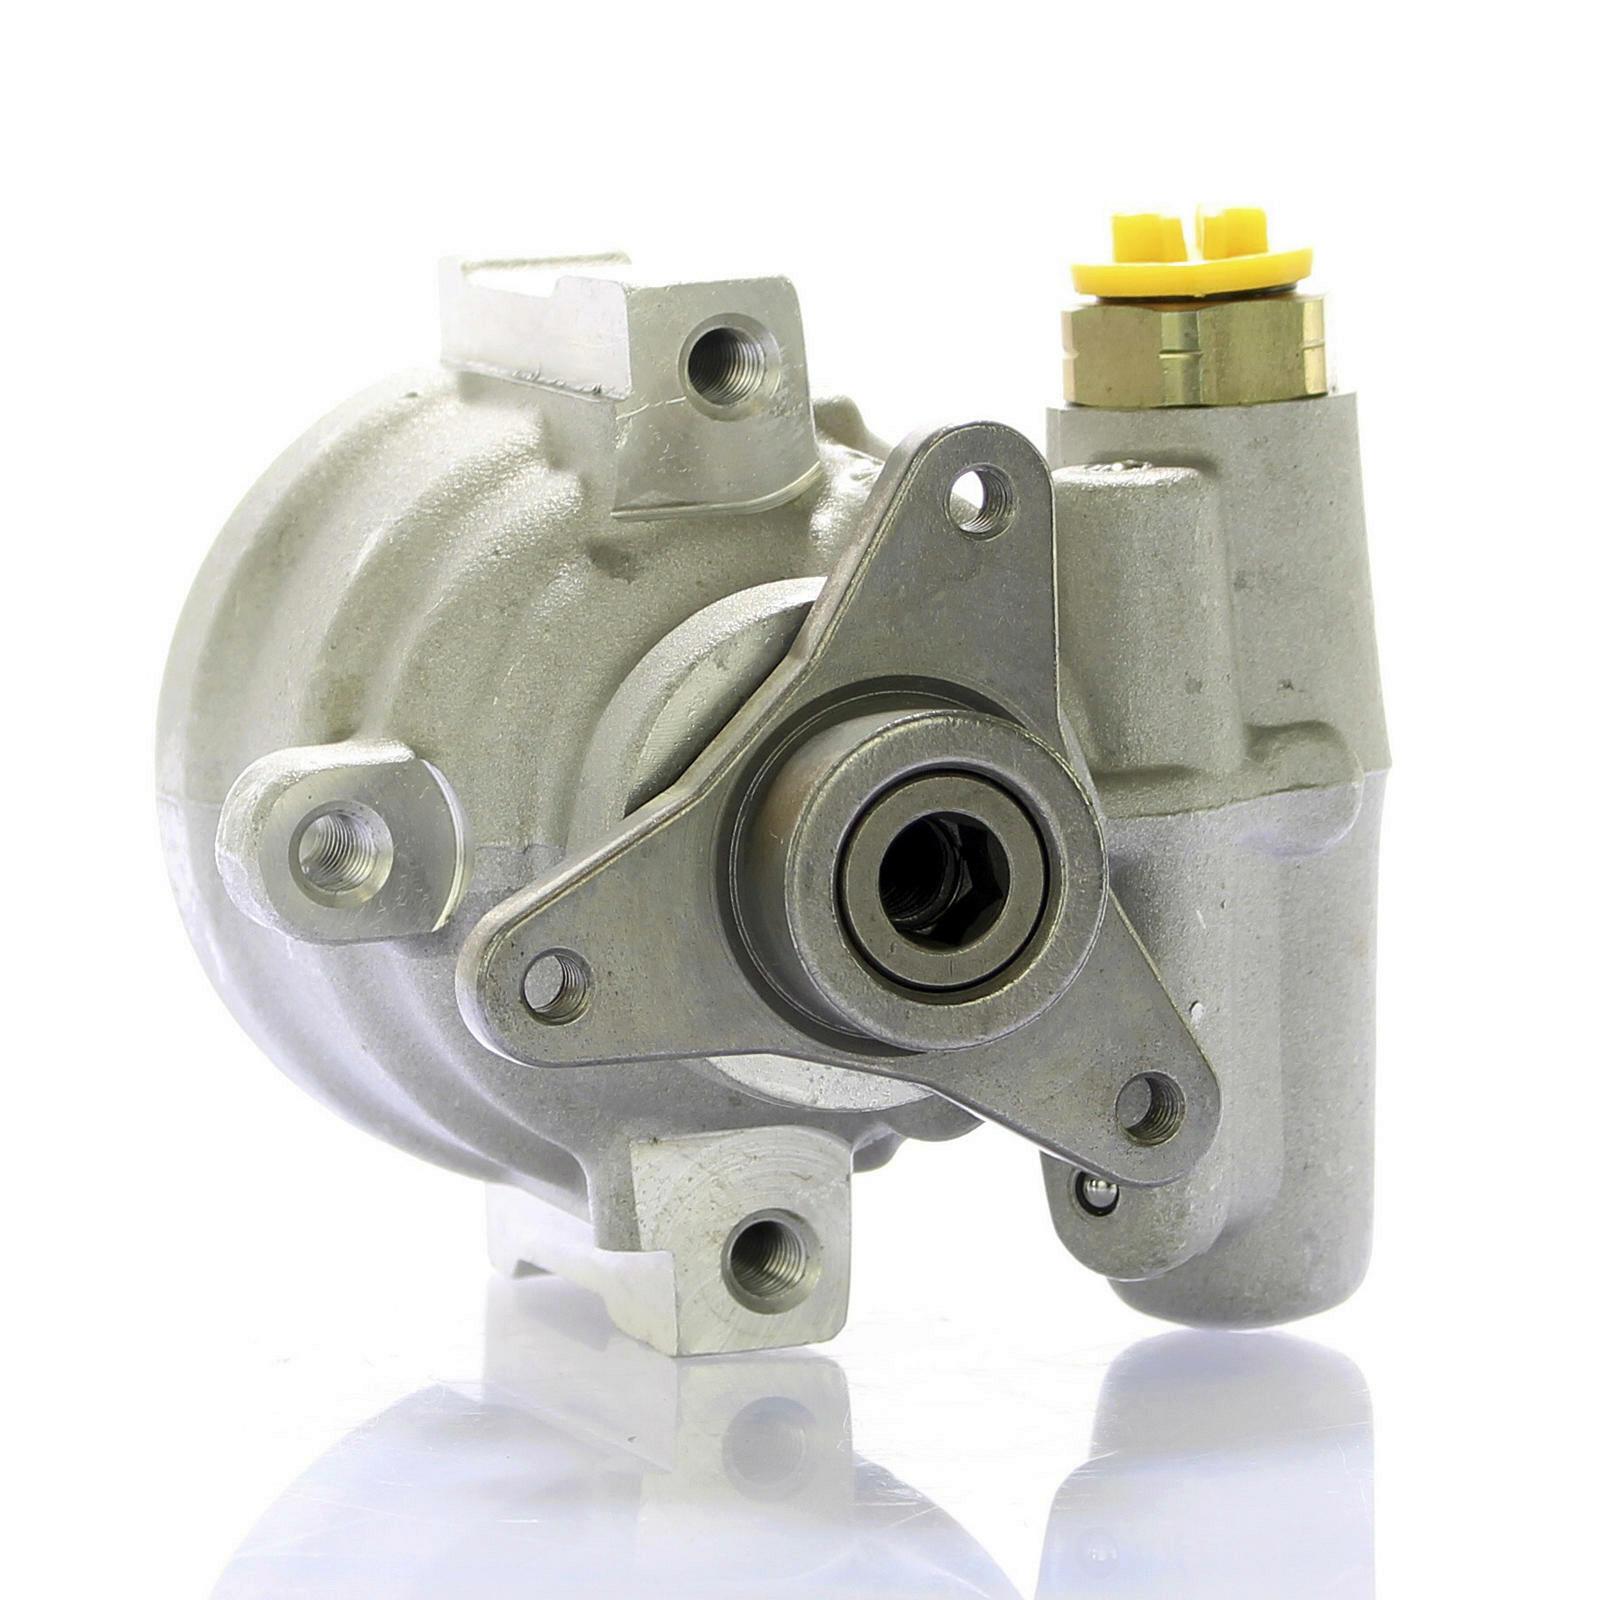 Servopumpe Hydraulikpumpe für RENAULT Clio / Kangoo / Laguna / Megane // DACIA